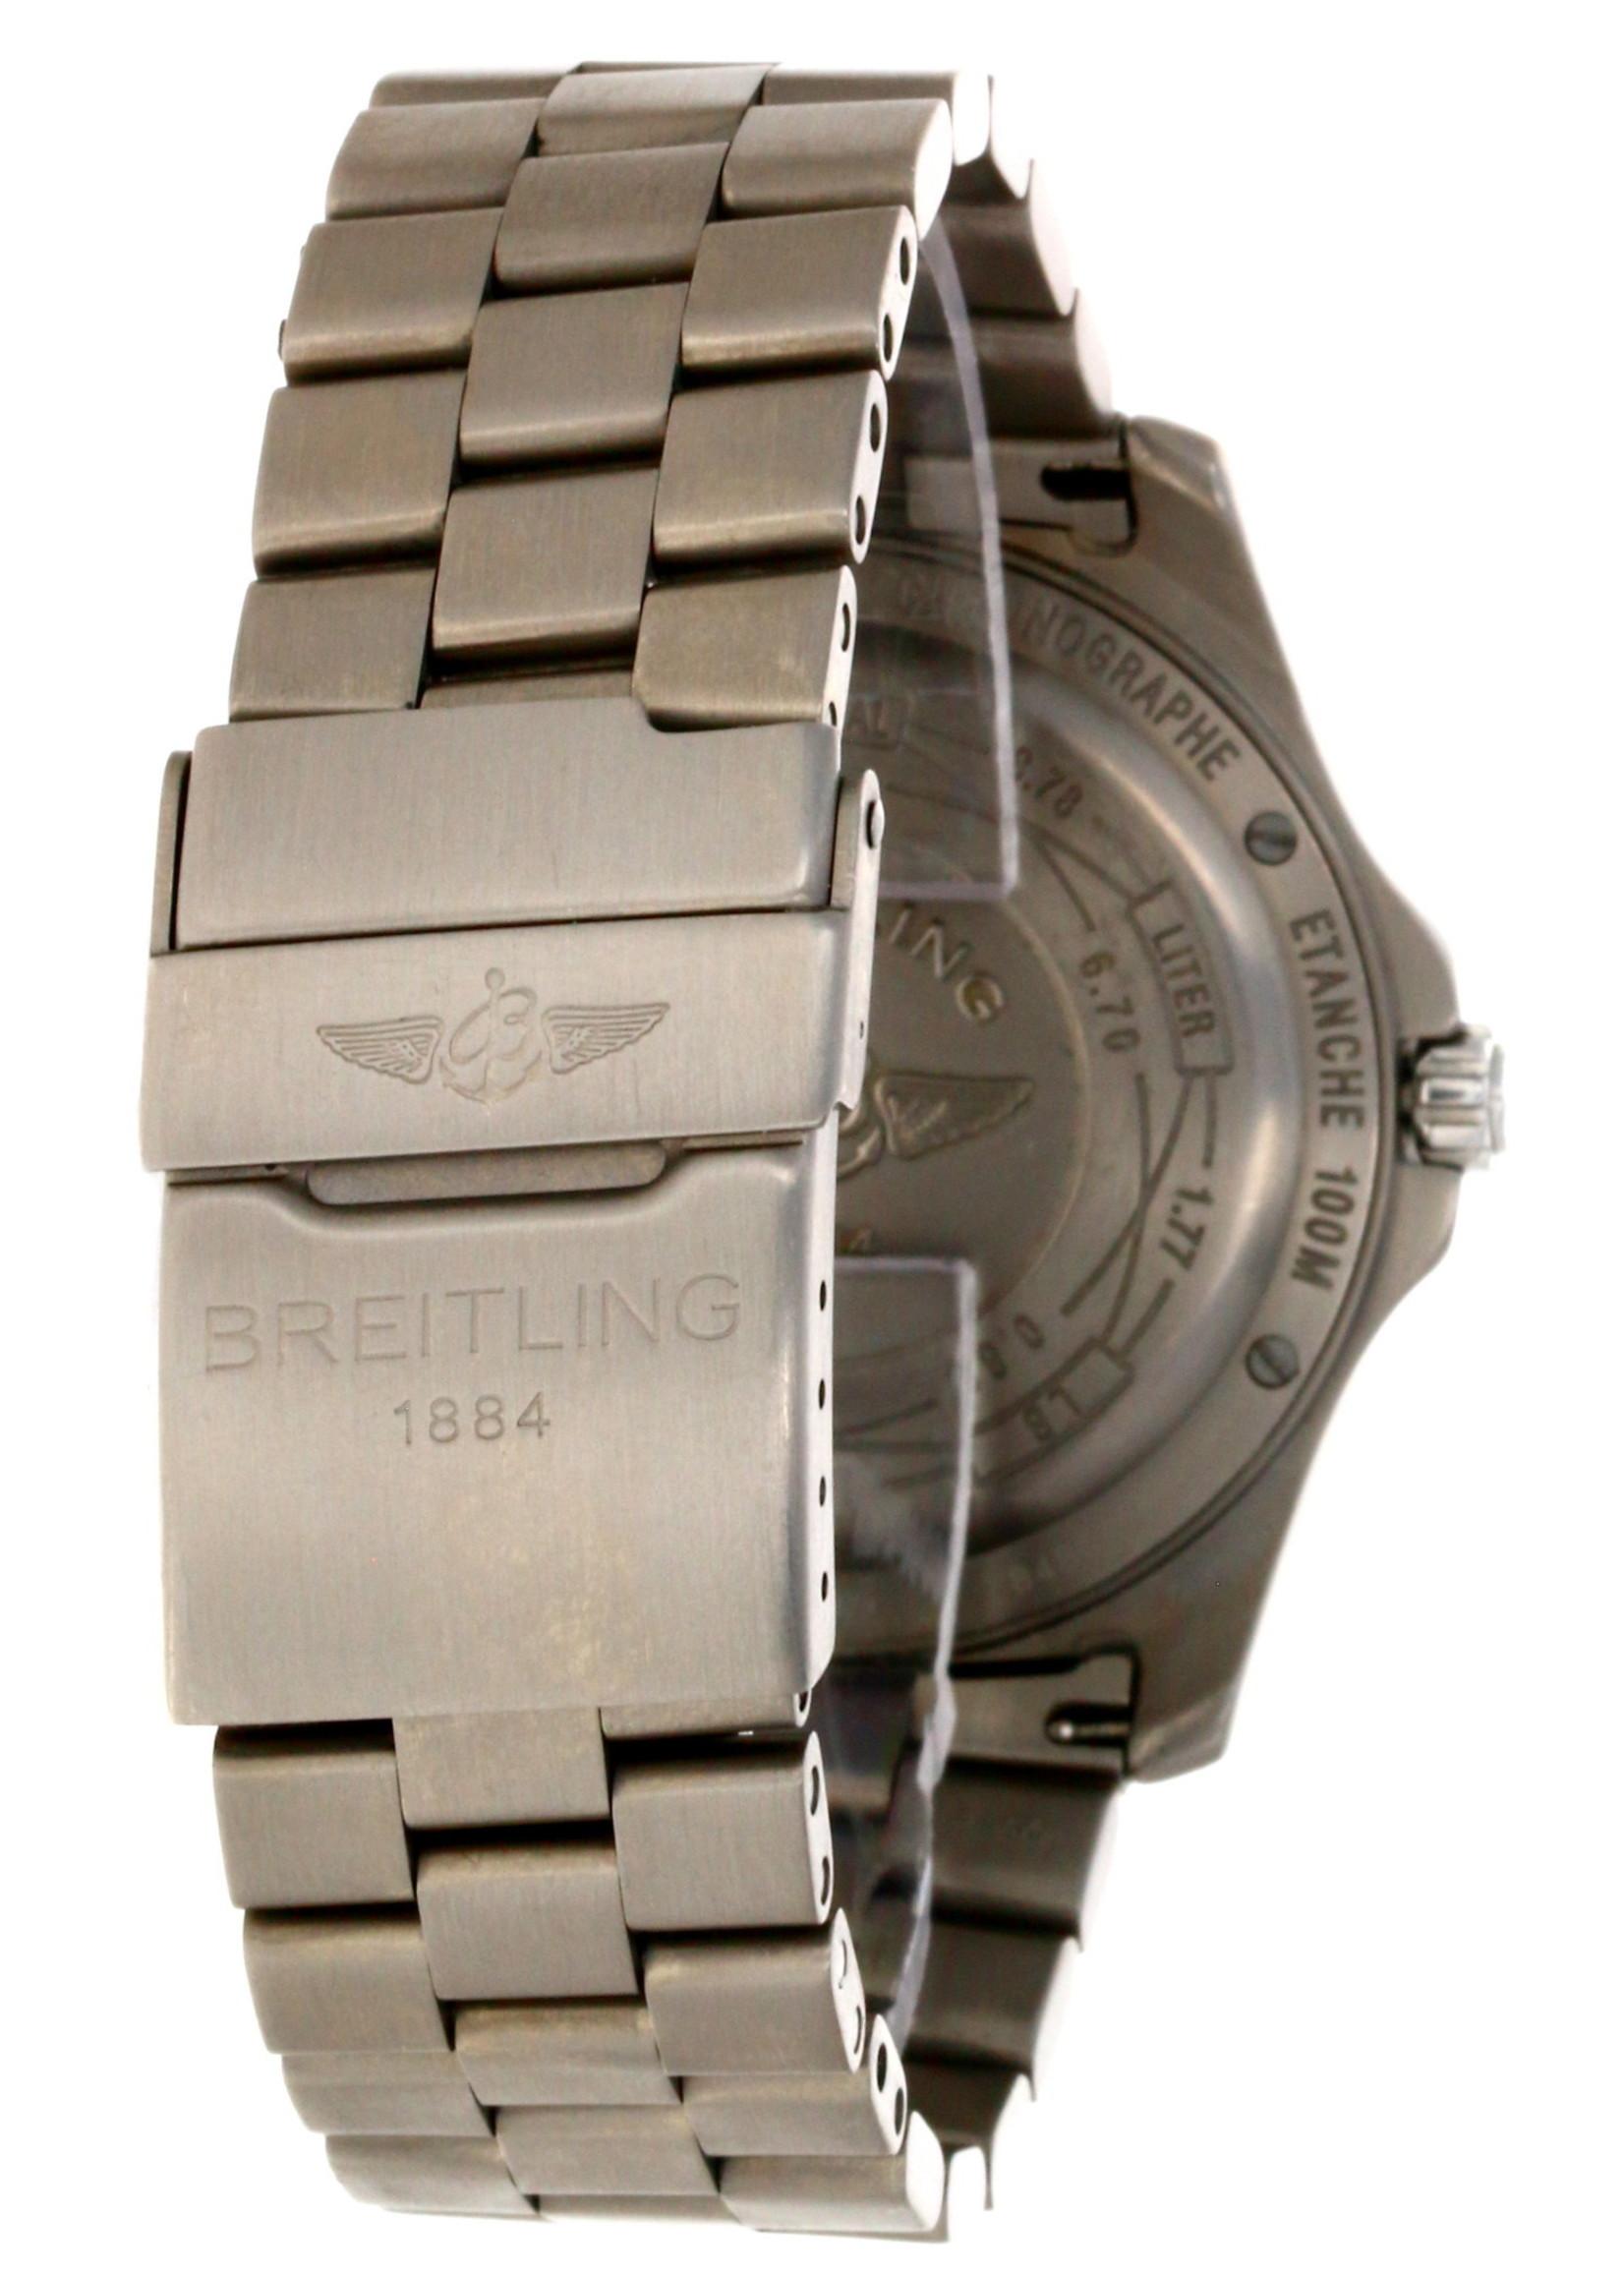 Breitling Breilting Aerospace Analog Digital